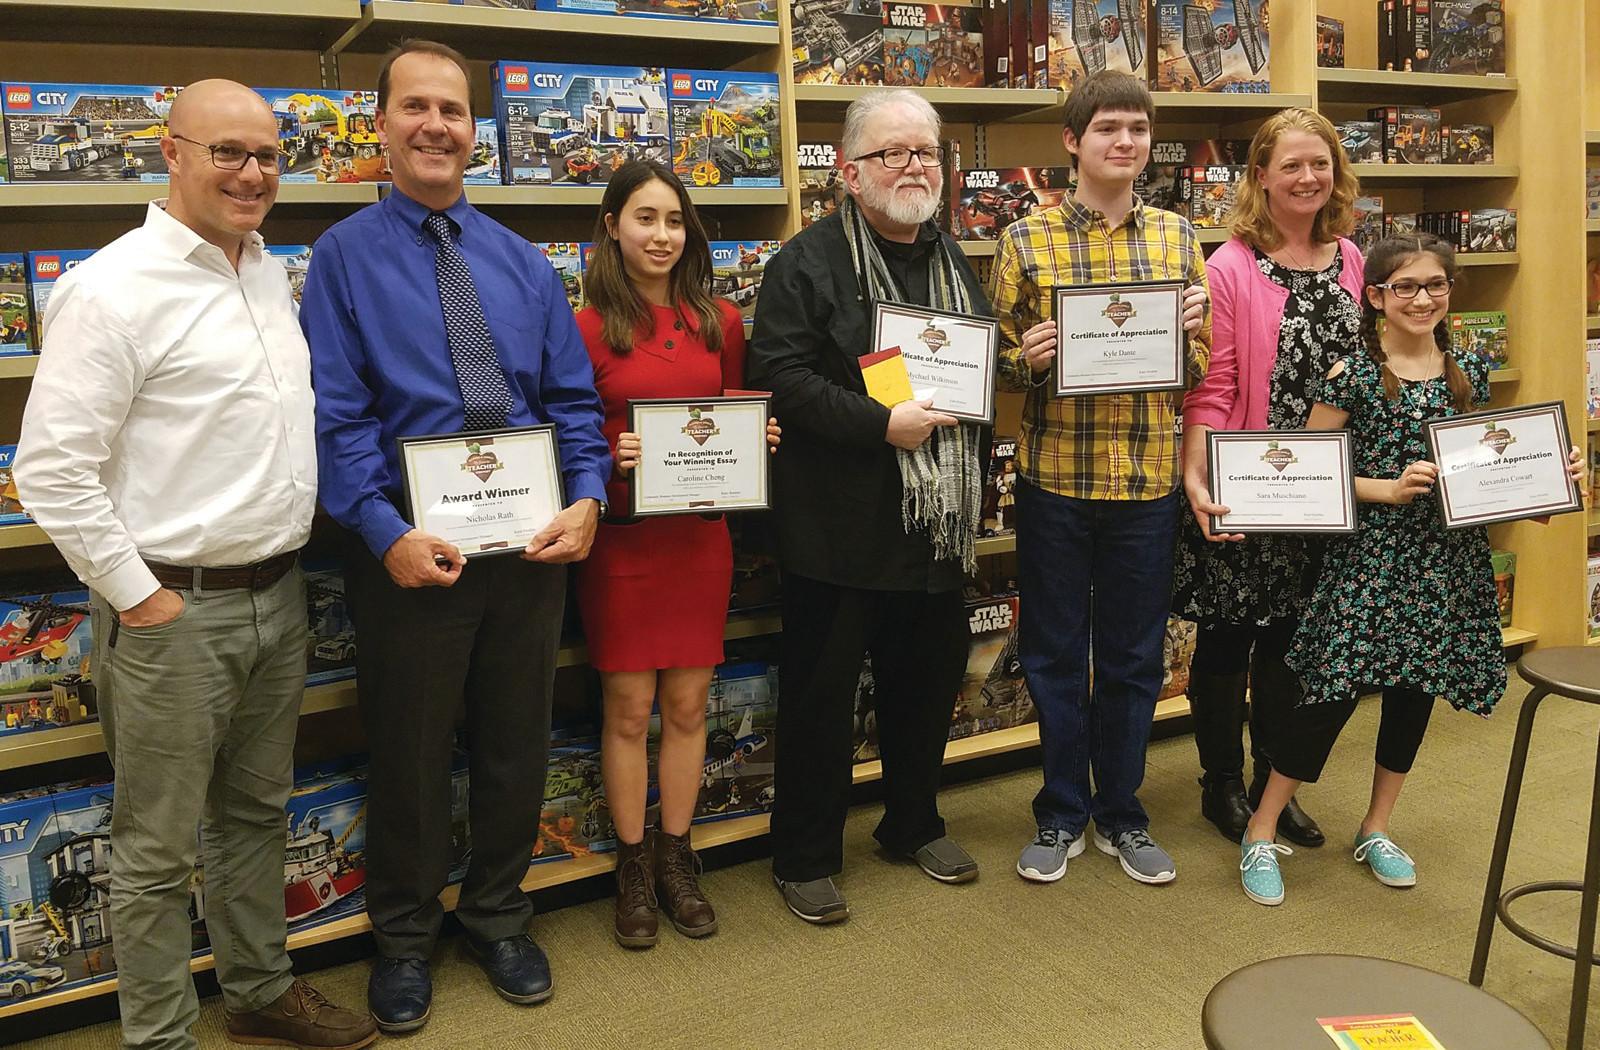 My favorite teacher essay contest winners